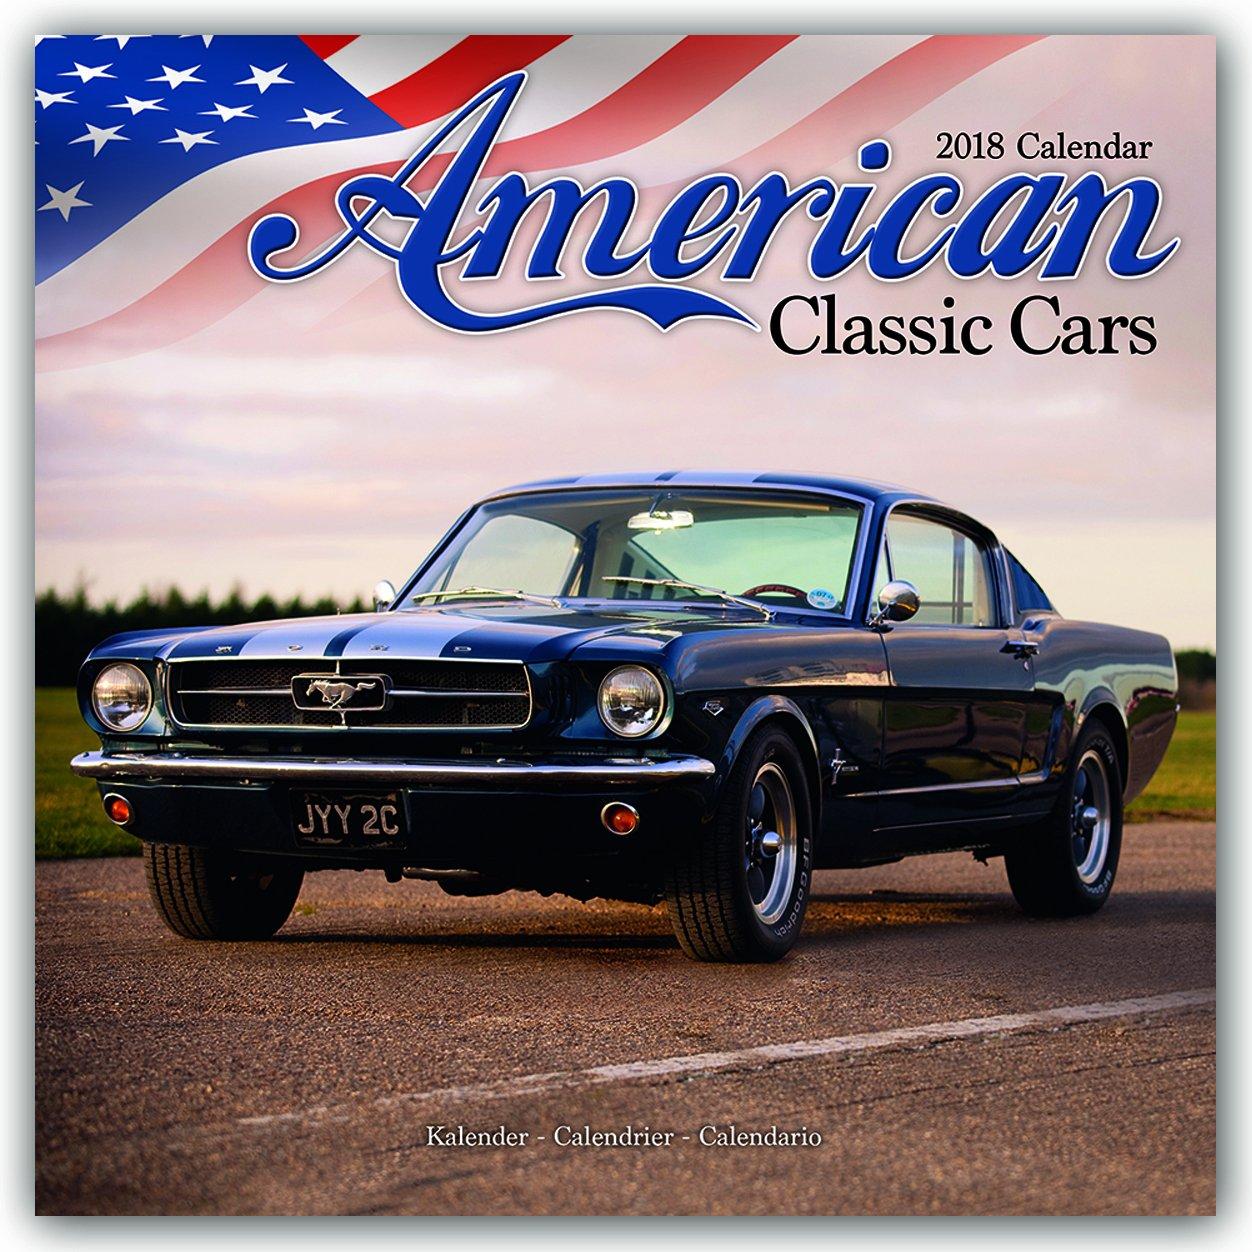 Classic Car Calendar - Muscle Car Calendar - American Muscle Cars ...